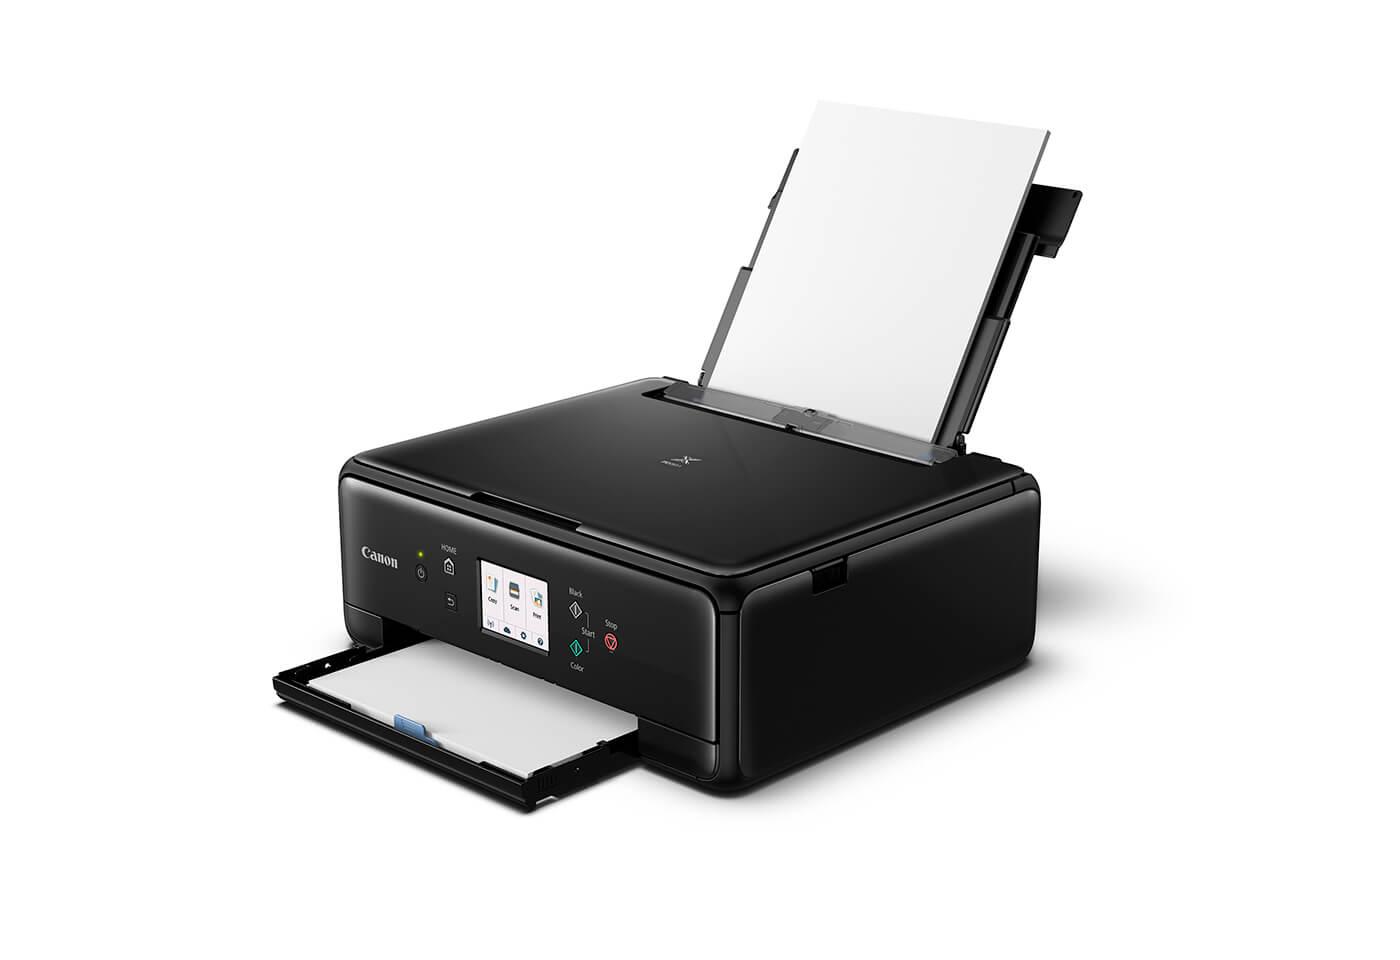 TS6160 dual paper